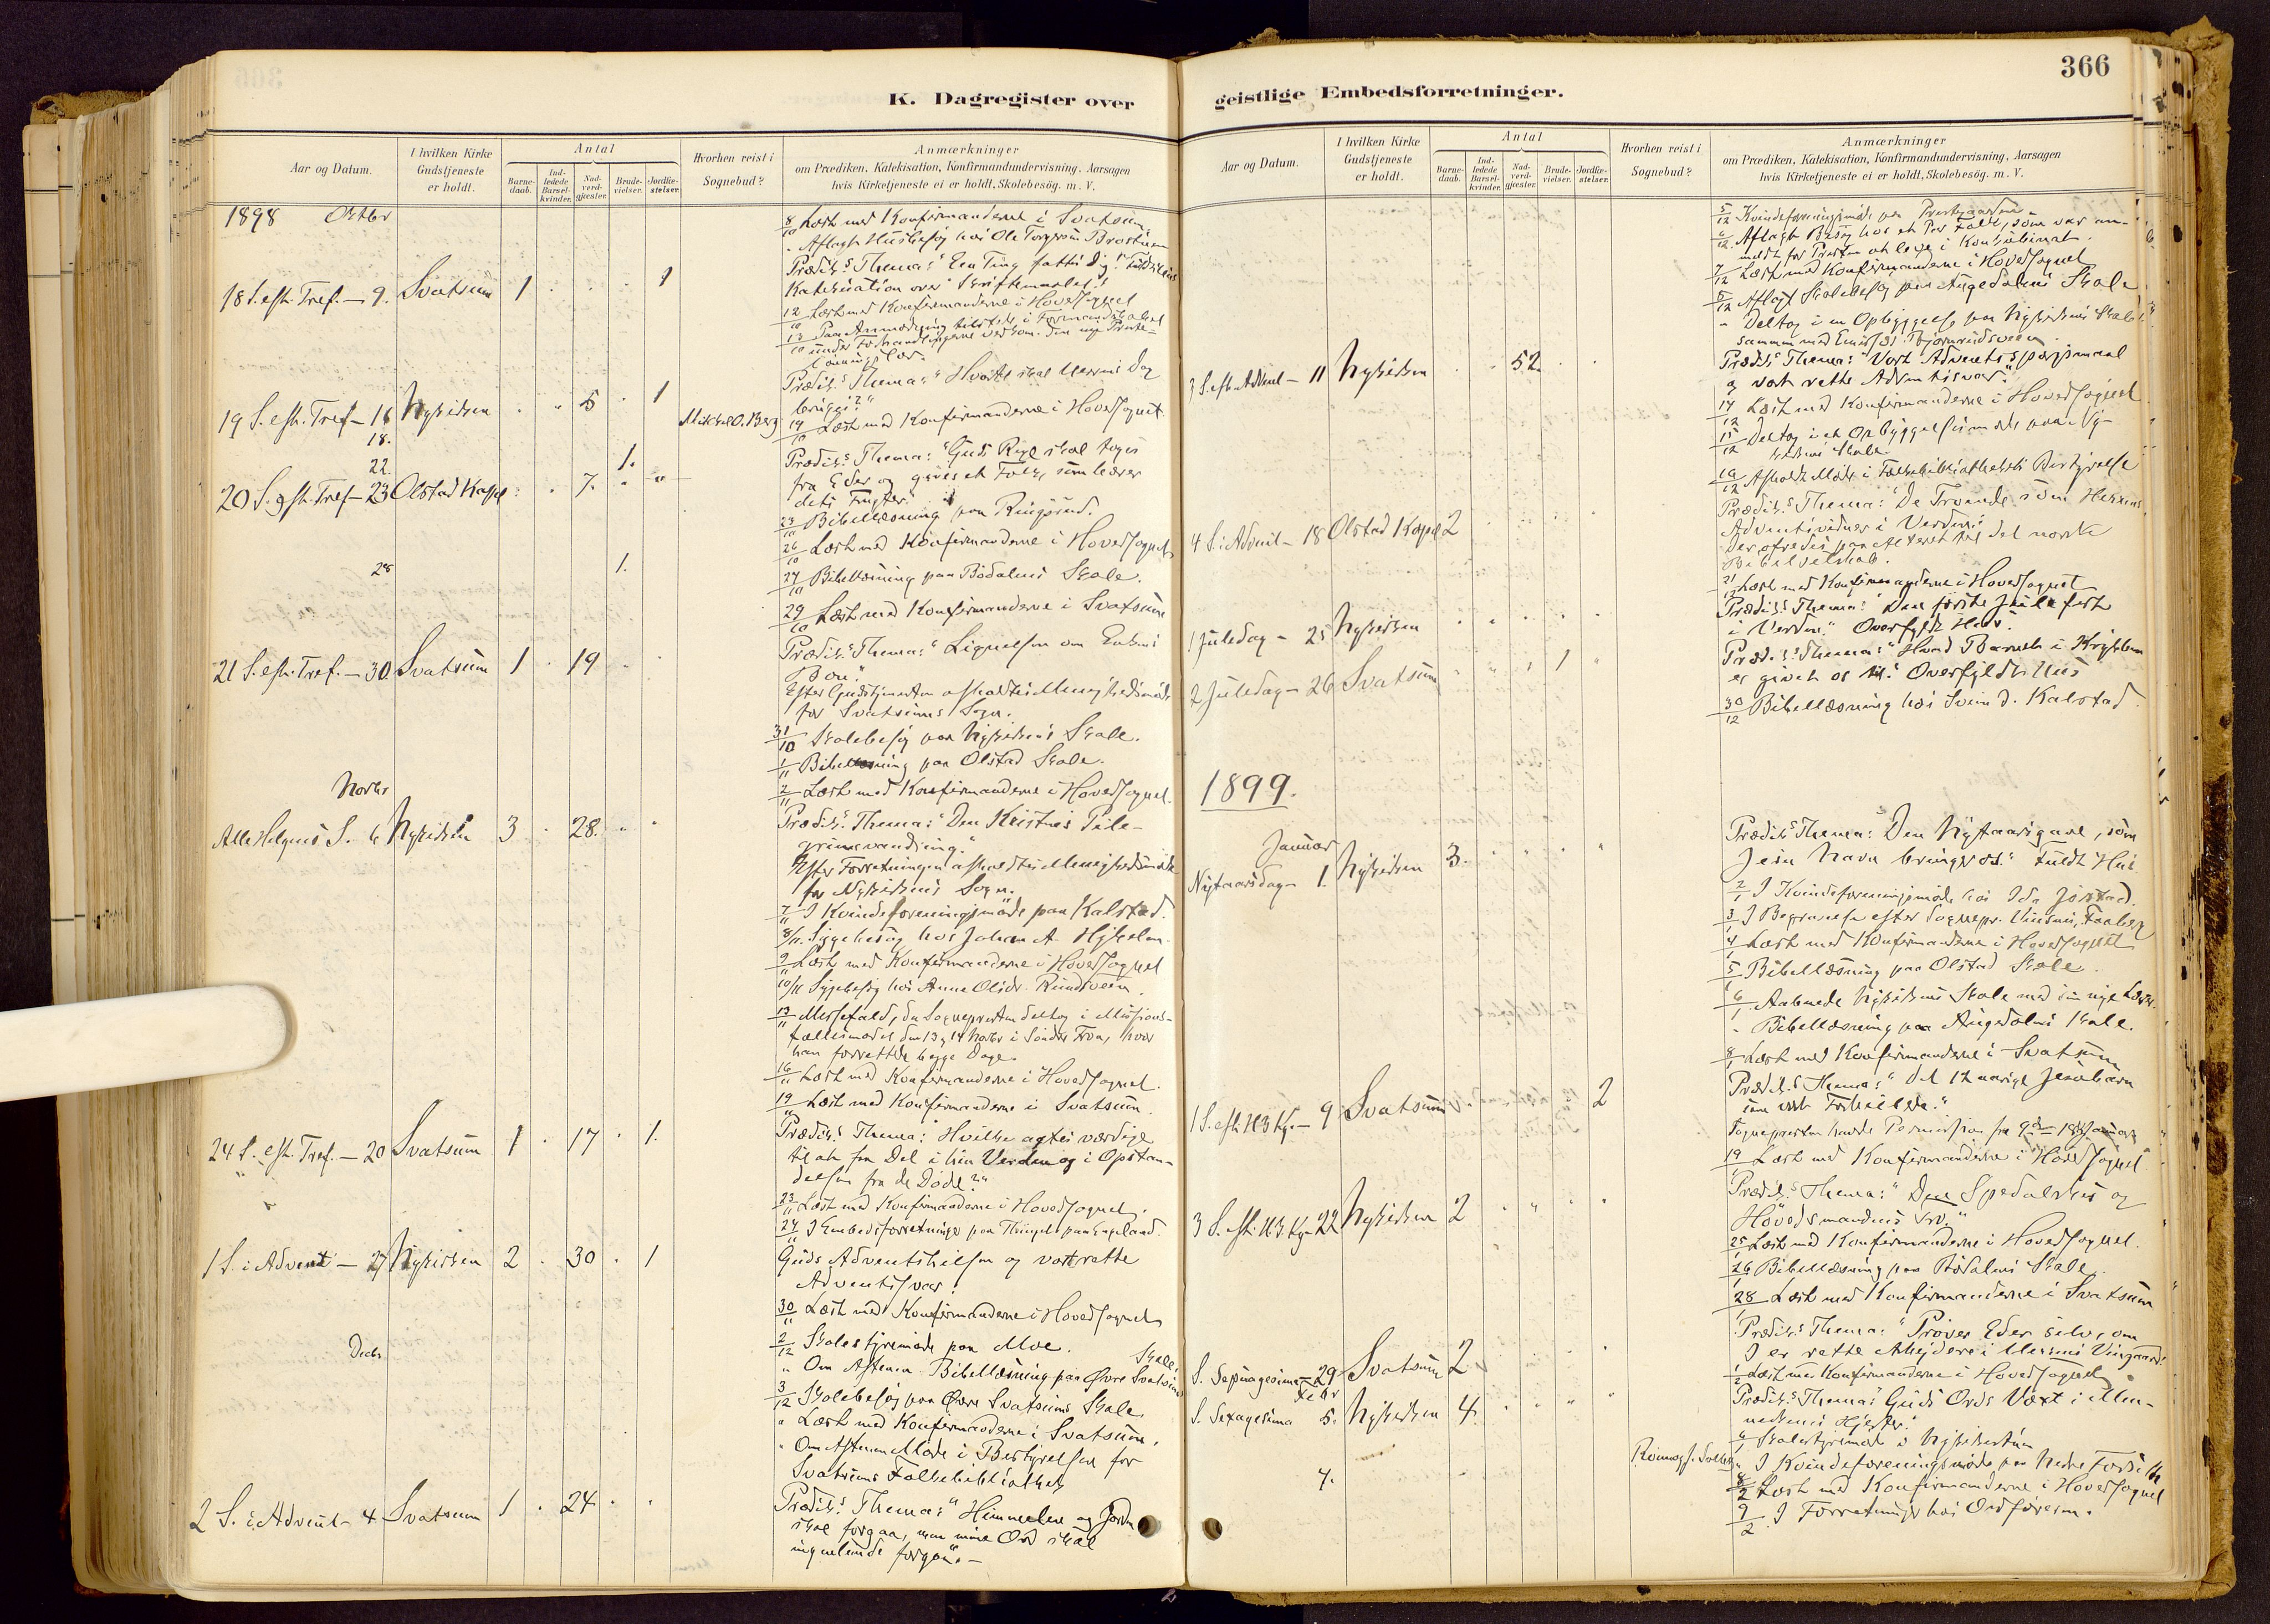 SAH, Vestre Gausdal prestekontor, Ministerialbok nr. 1, 1887-1914, s. 366